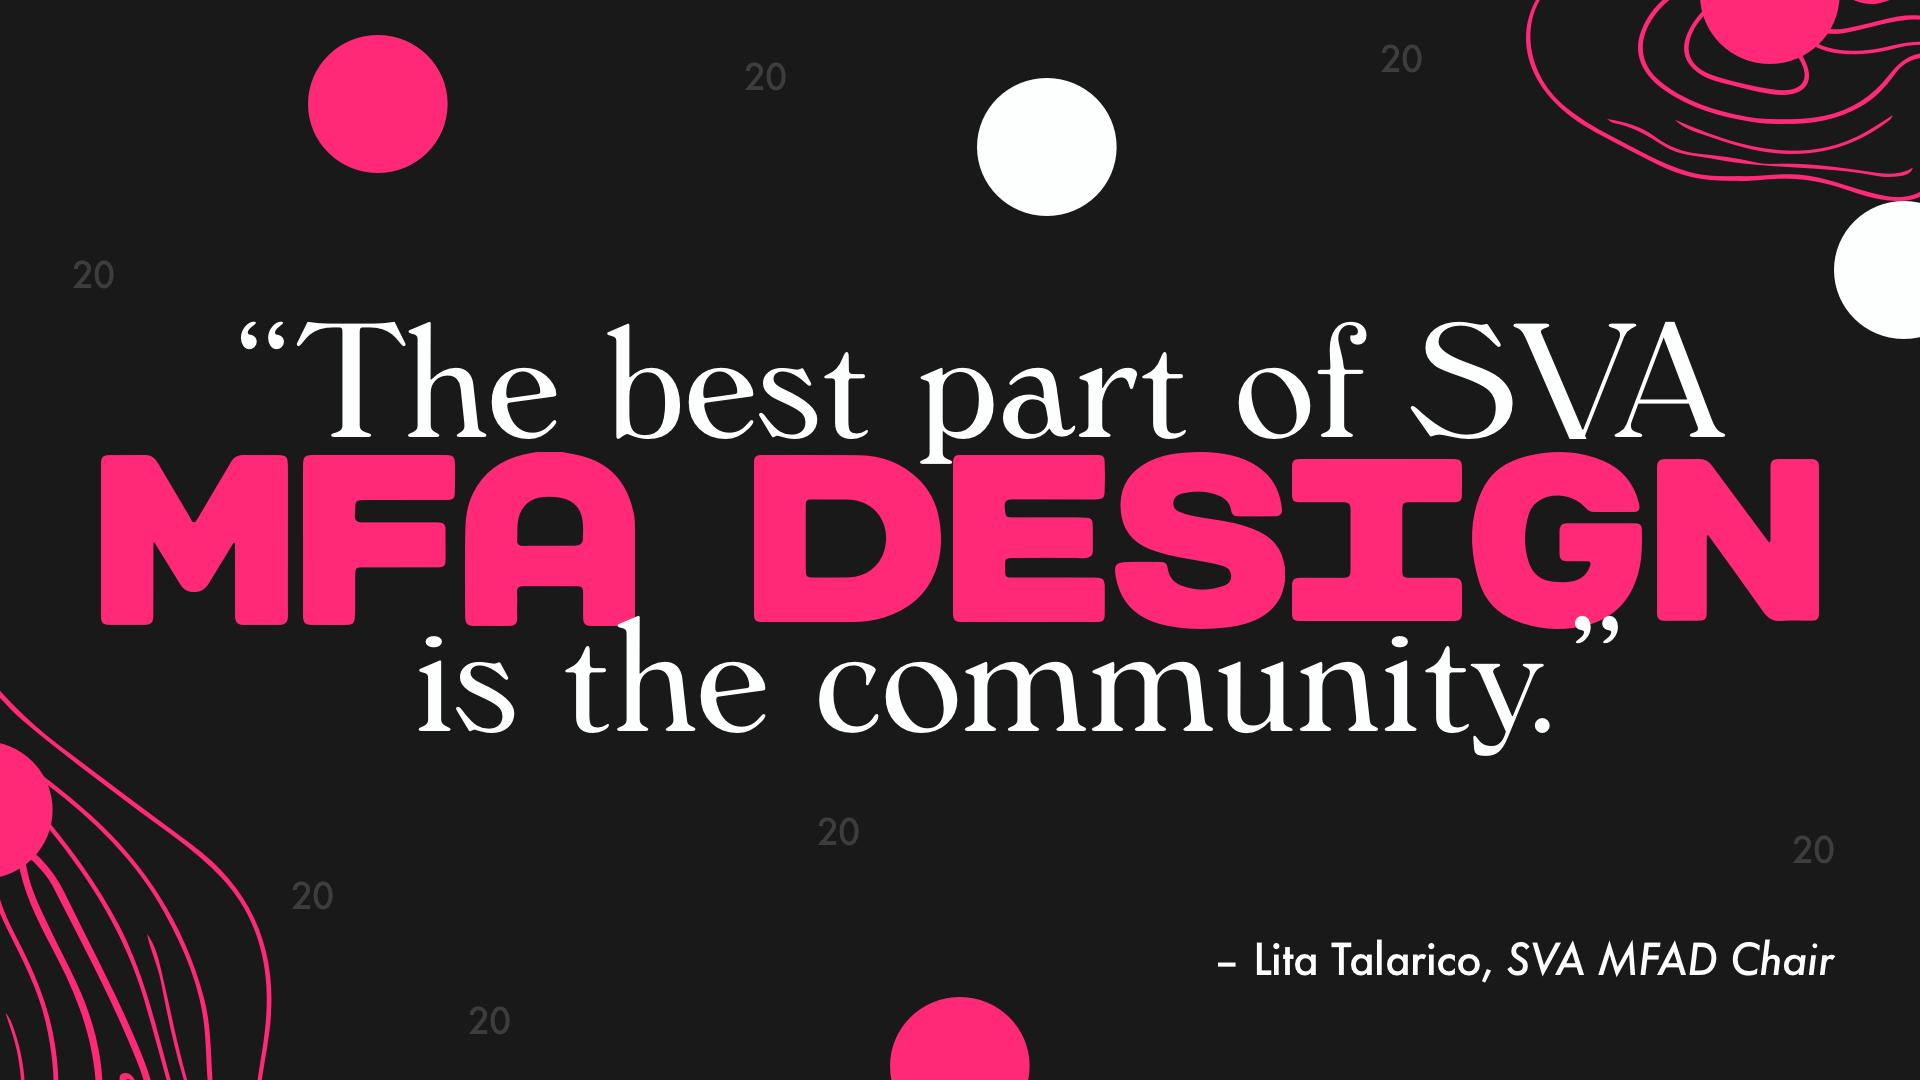 MFA Design Community